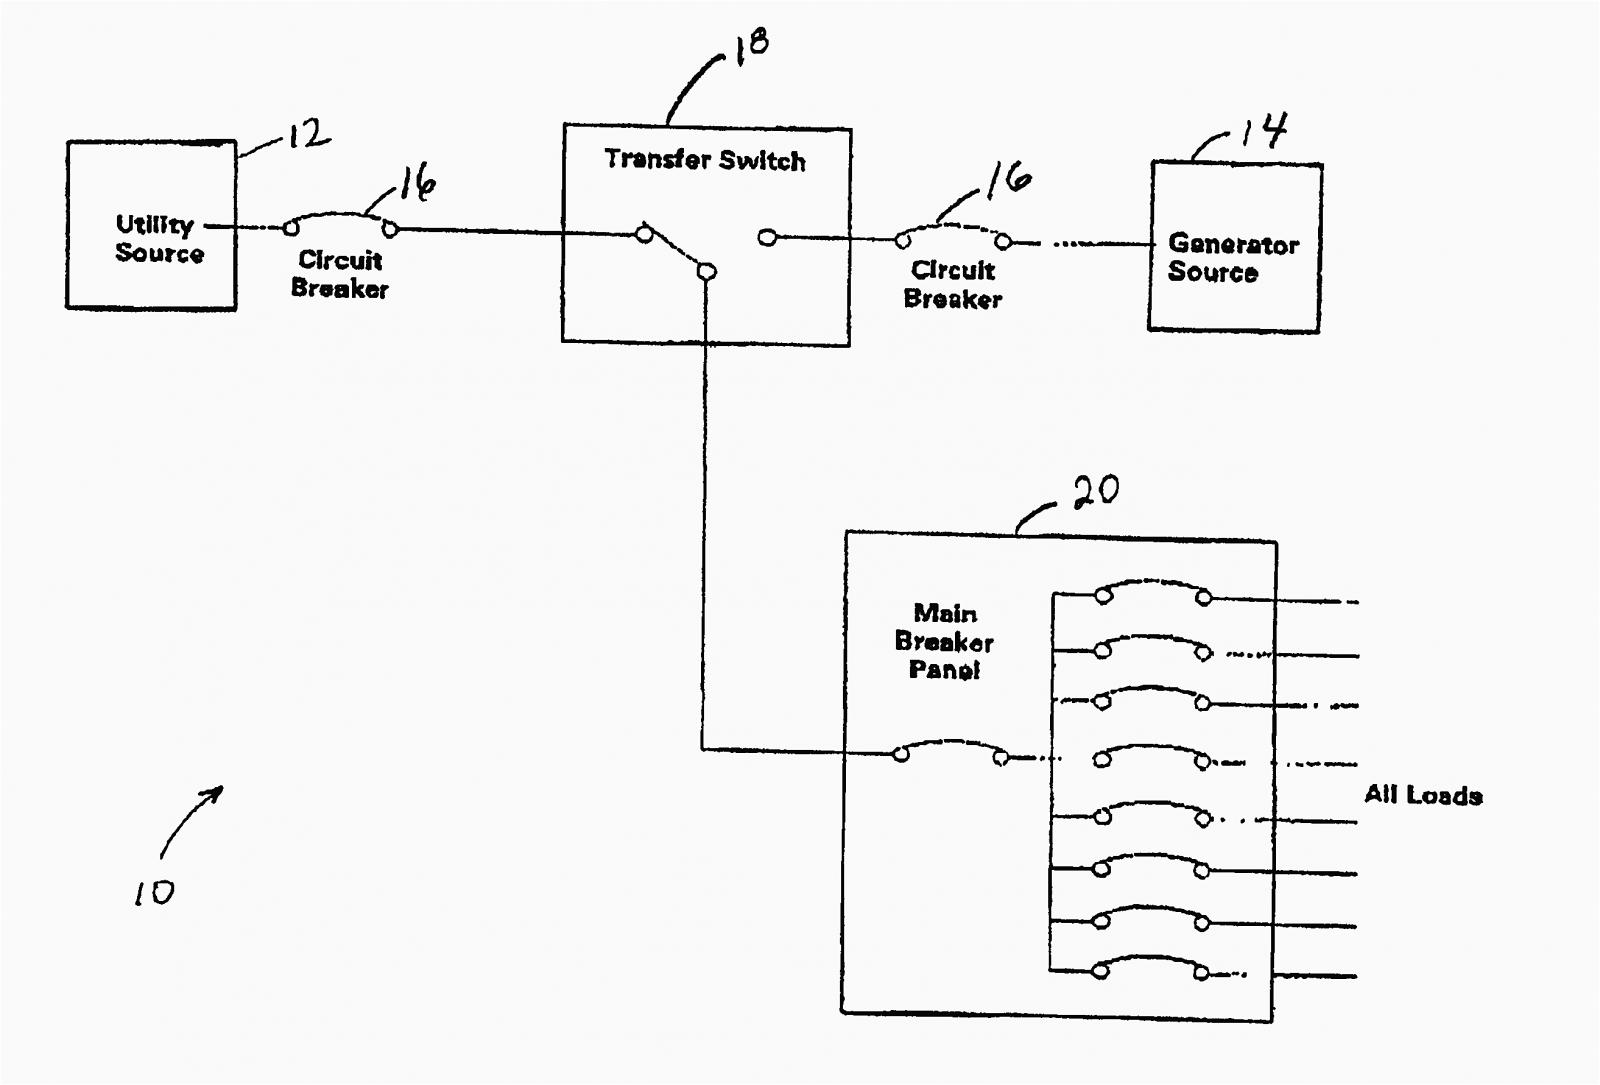 hight resolution of rtd pt100 3 wire wiring diagram rtd pt100 3 wire wiring diagram elegant magnificent 4